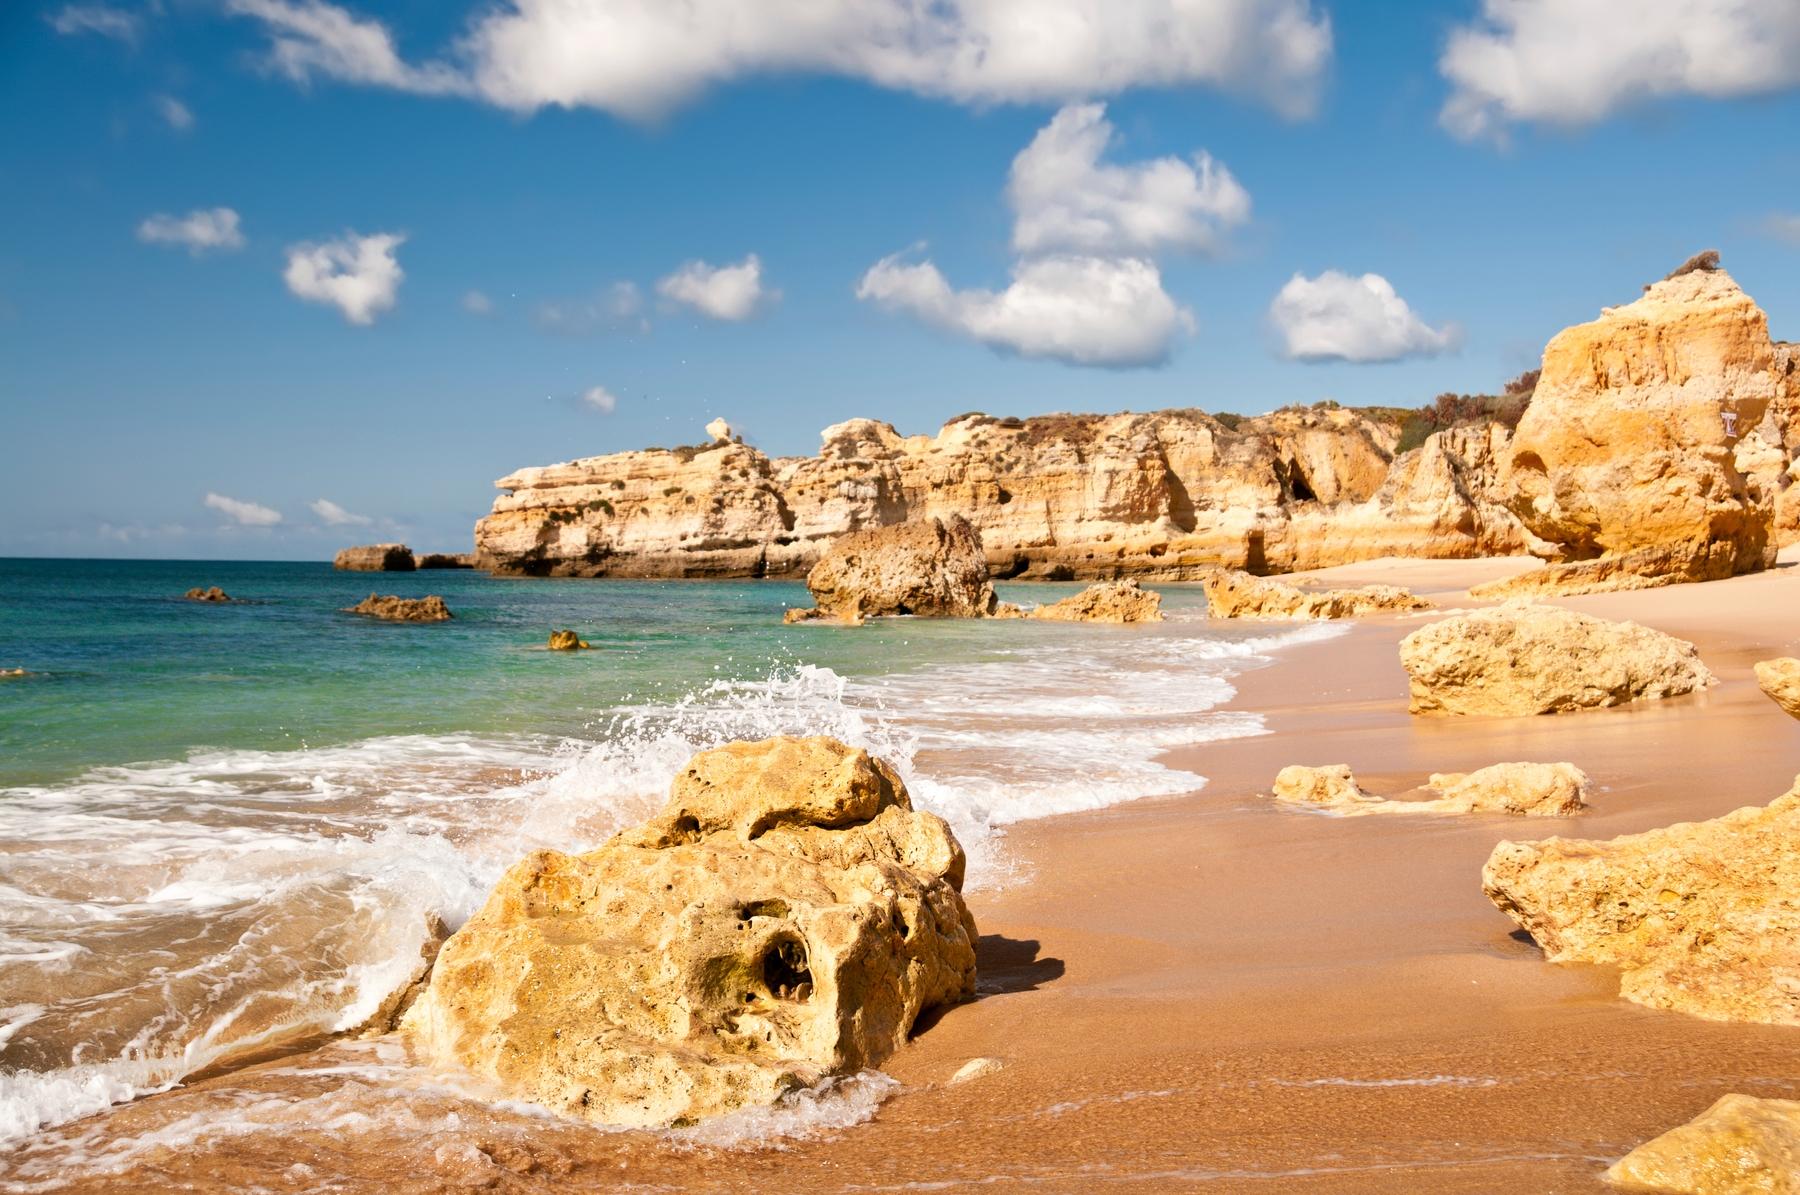 The Algarve is ideal for cheap beach holidays